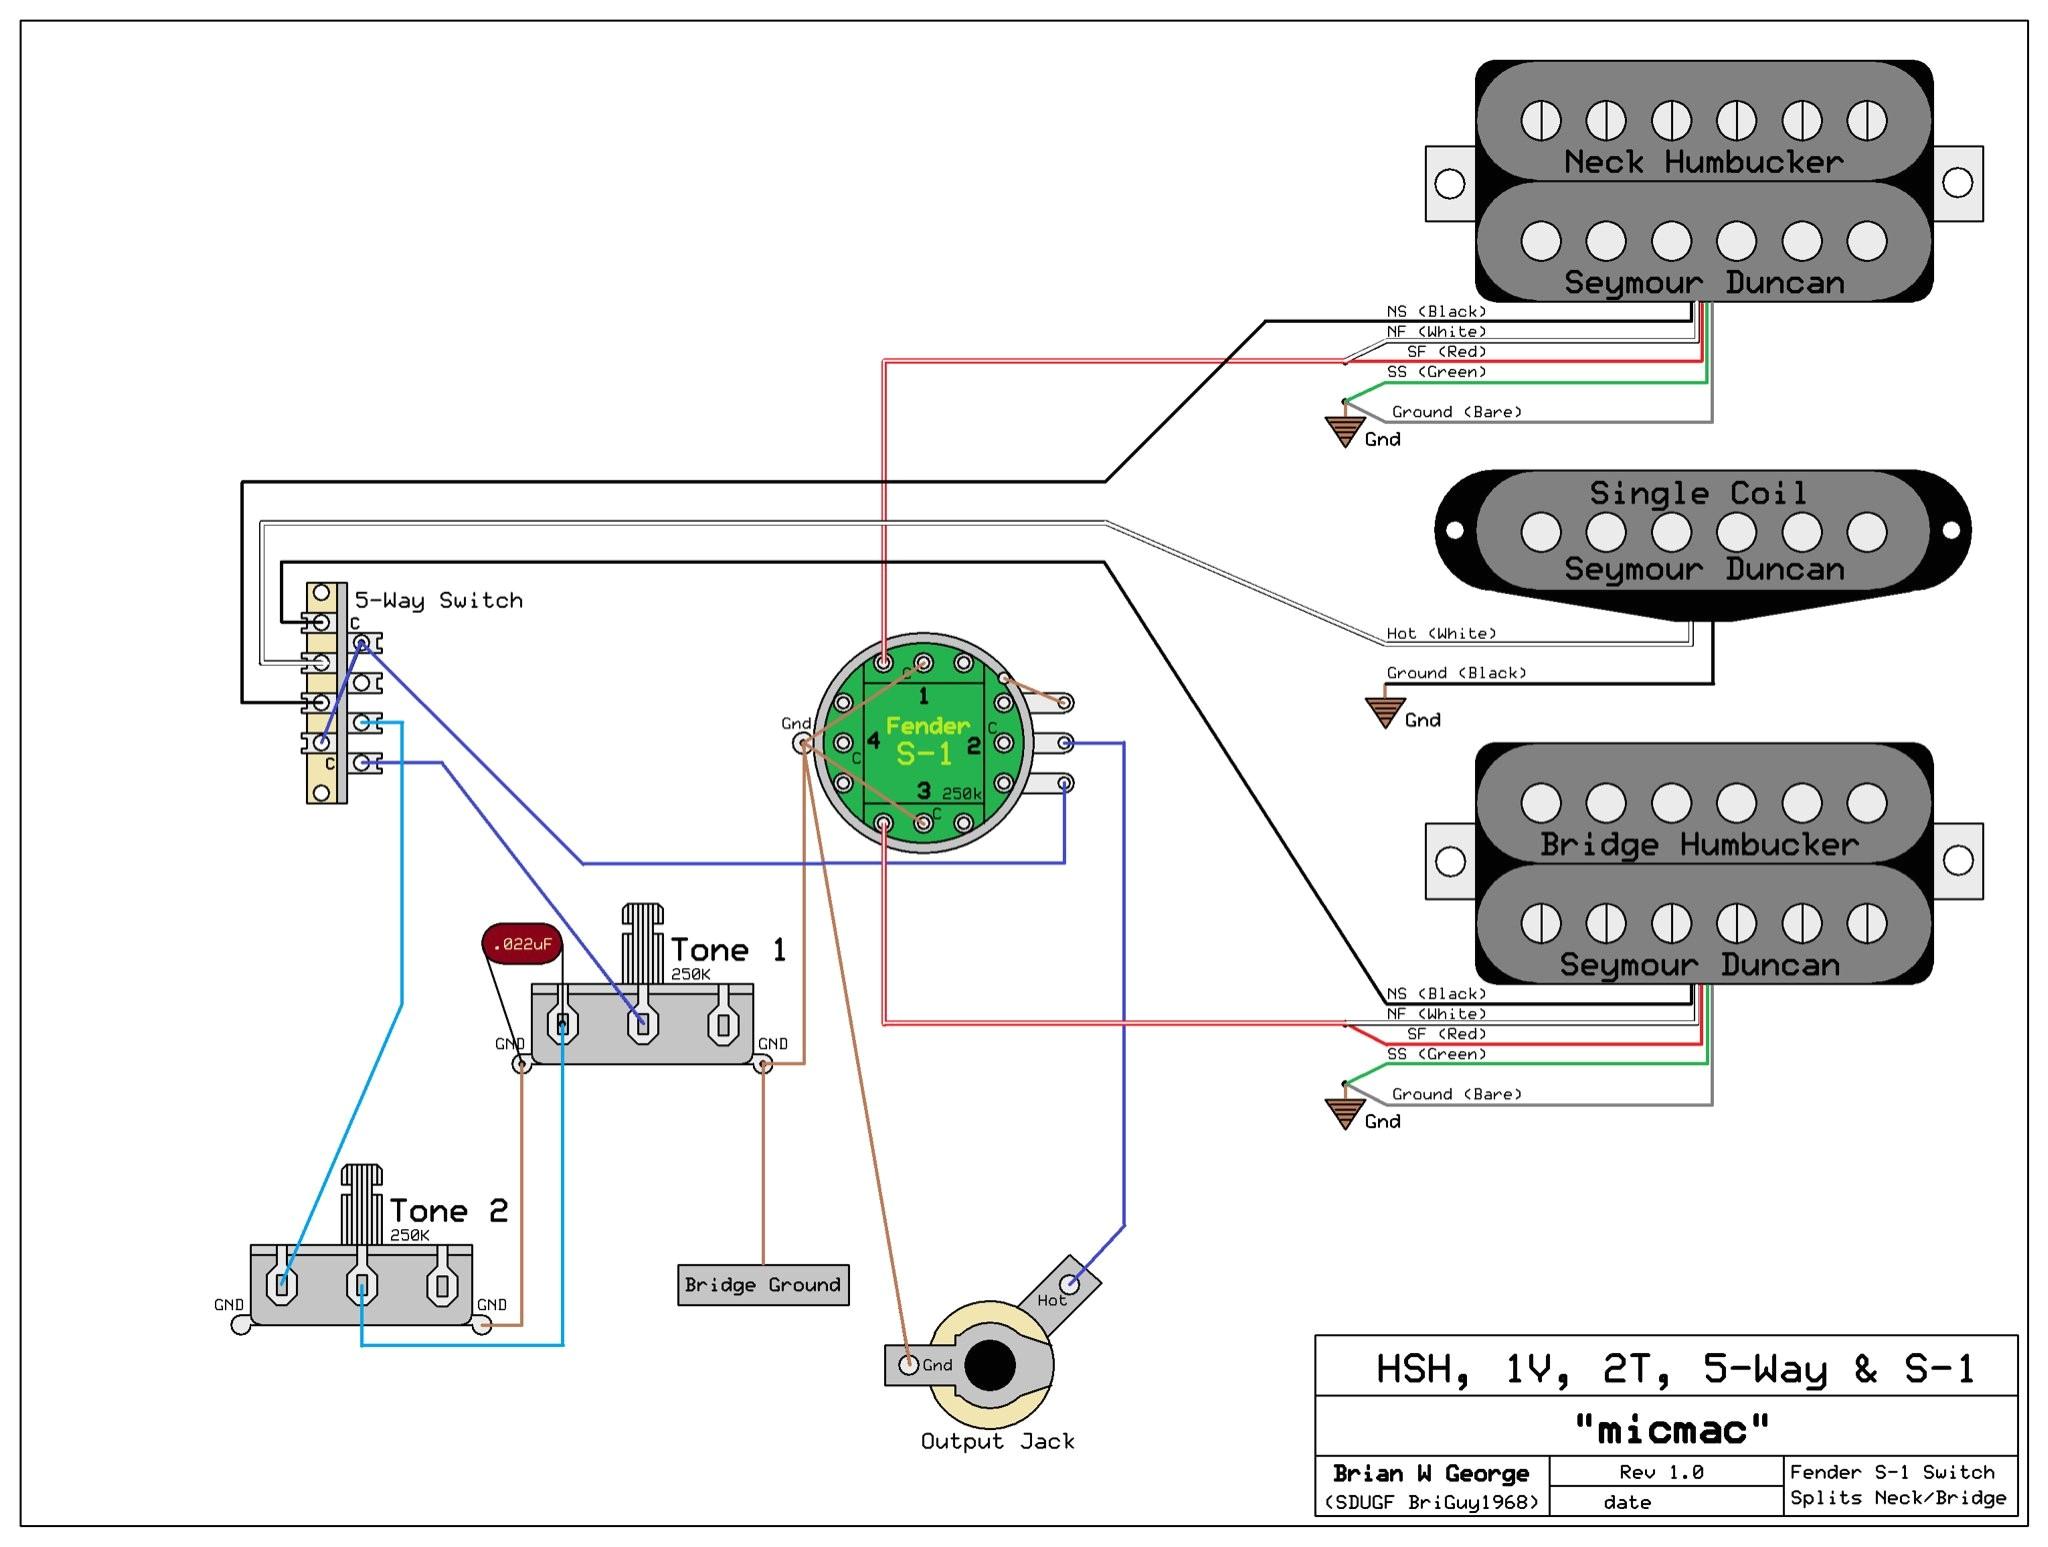 fender tele s1 wiring diagram wiring diagram telecaster s1 switch wiring furthermore fender telecaster wiringfender s1